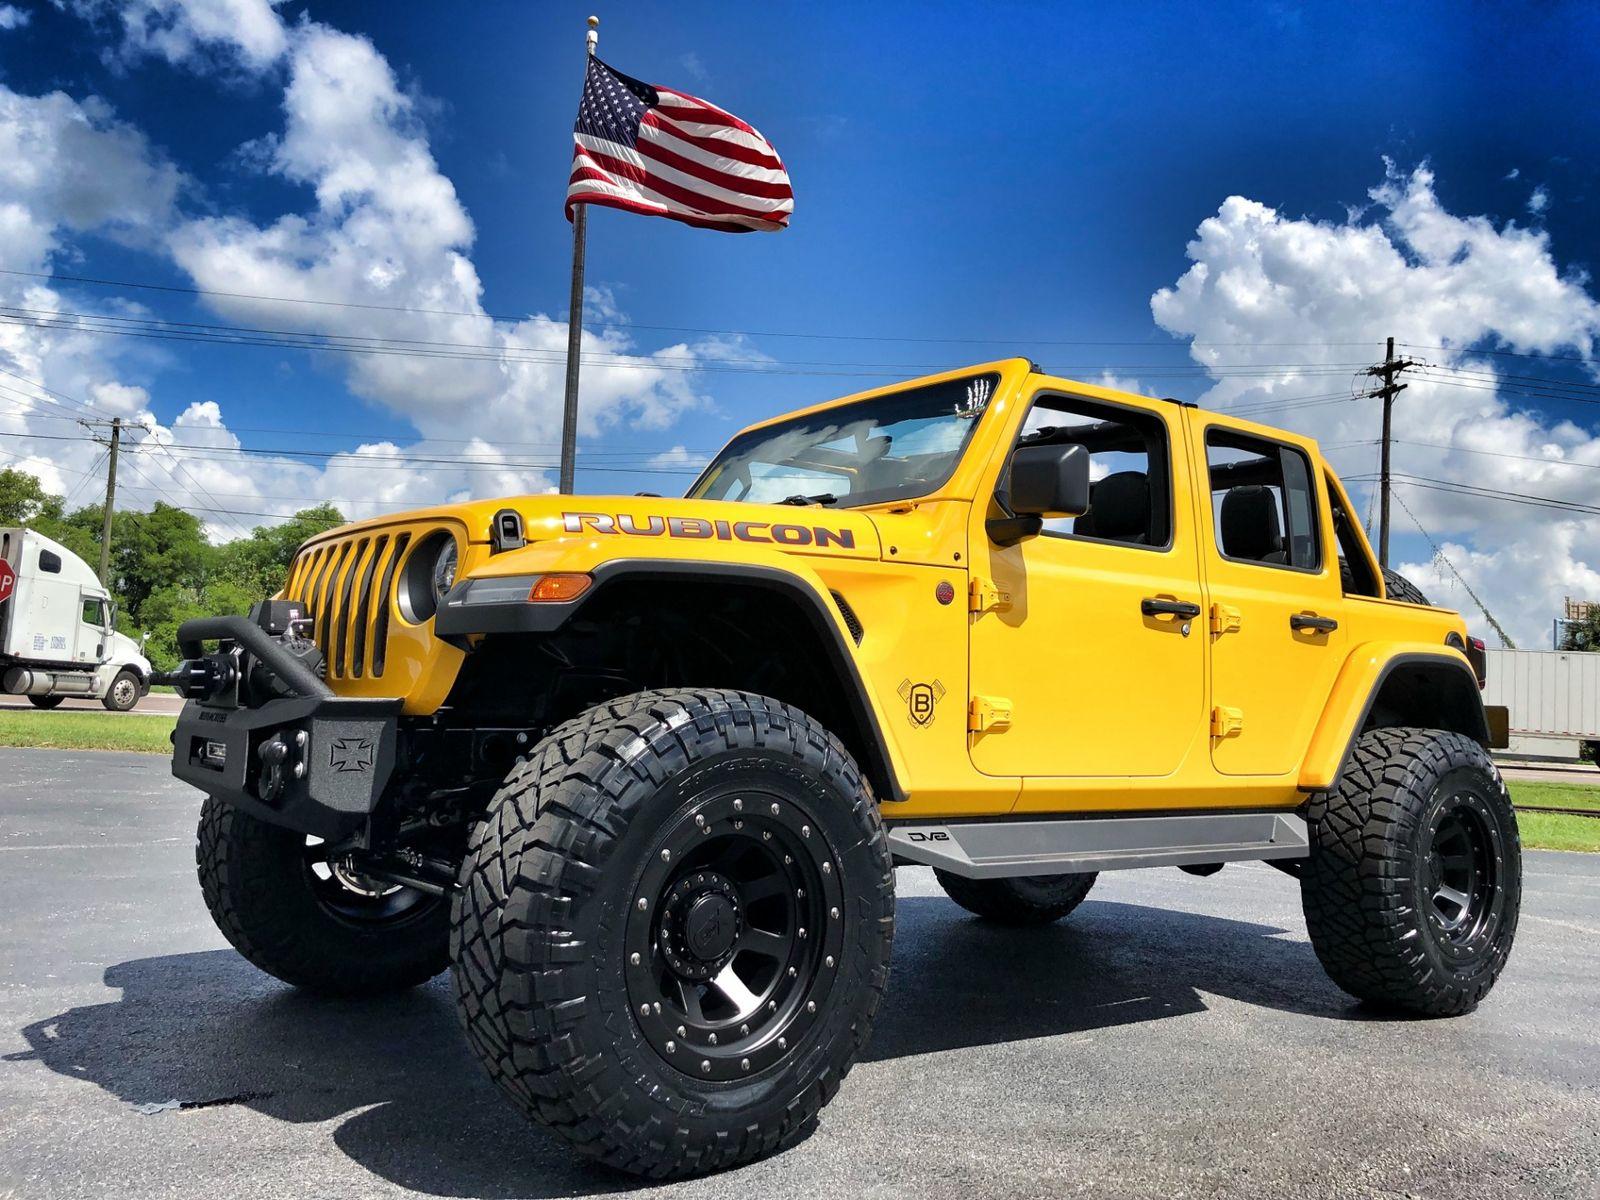 2018 jeep all new wrangler unlimited rubicon hellayella litfed leather nav 38 nittos florida. Black Bedroom Furniture Sets. Home Design Ideas